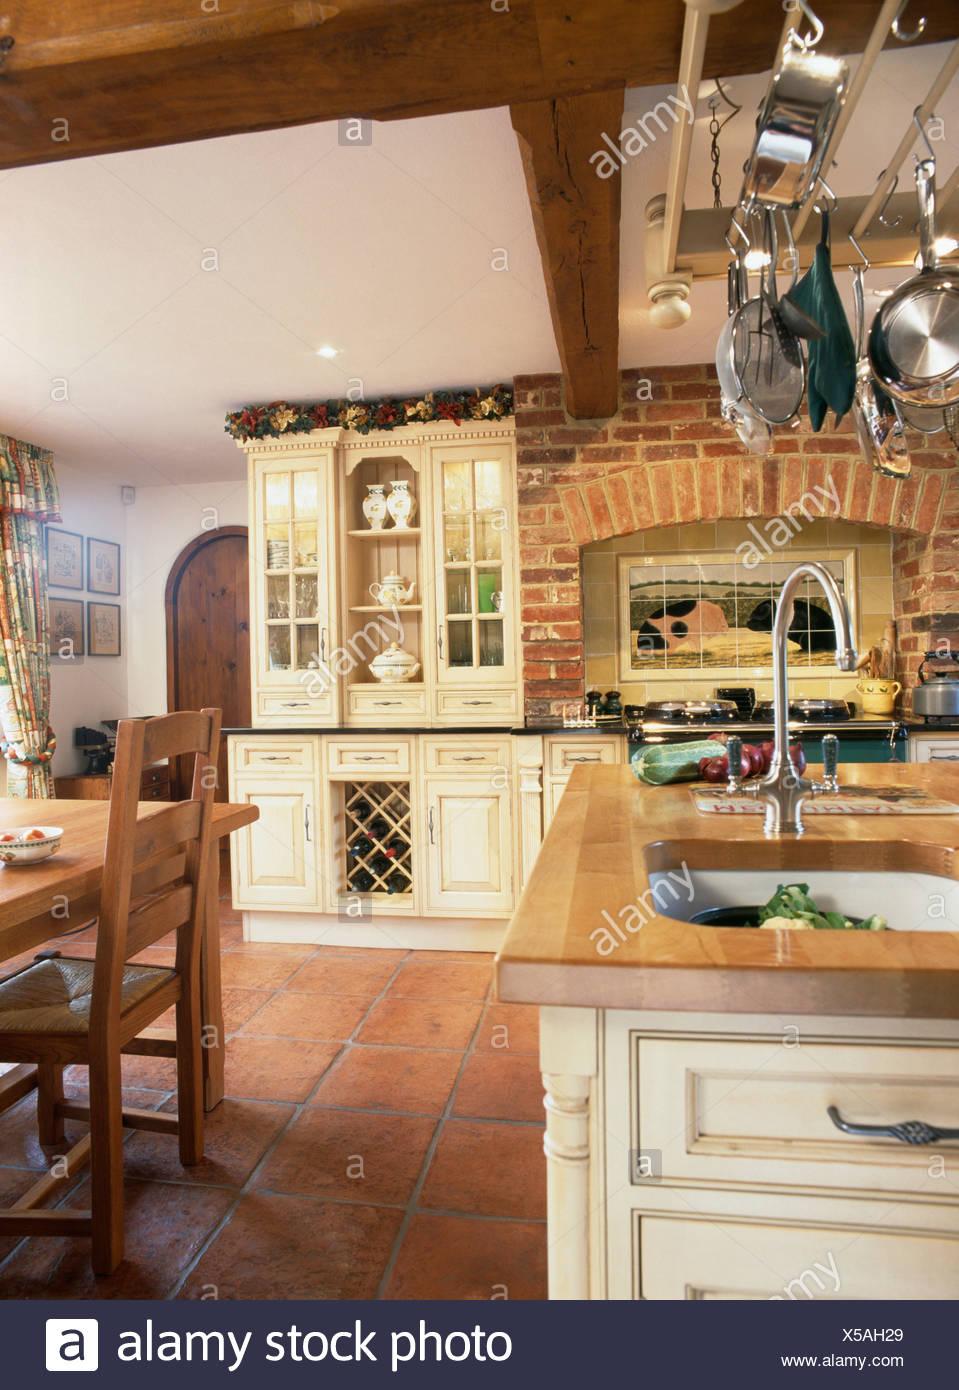 Interiors Kitchens Traditional Sinks Imágenes De Stock & Interiors ...